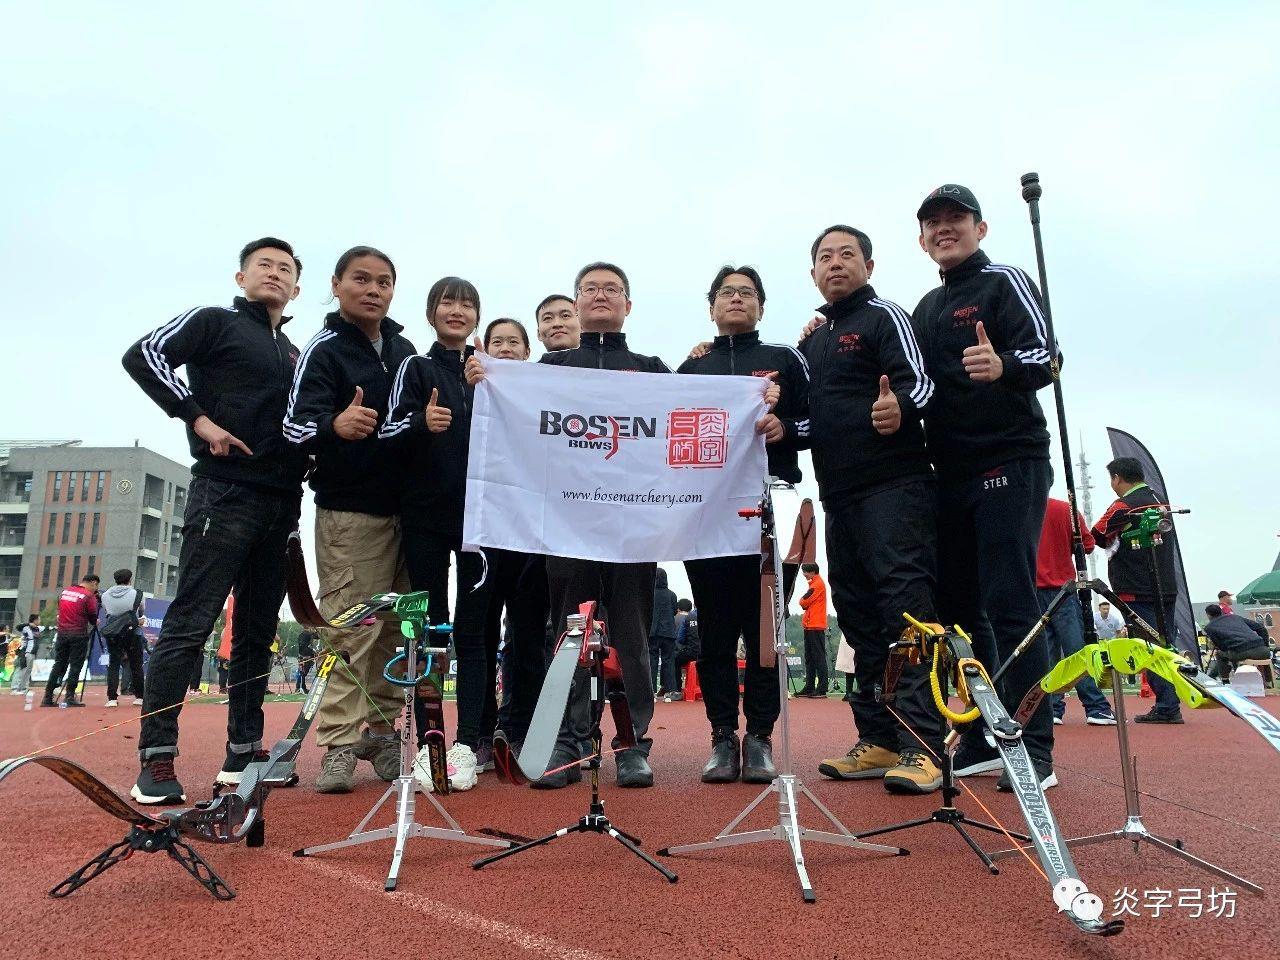 Yanzi Gongfang | 2019. APCC Outdoor Archery Champi...